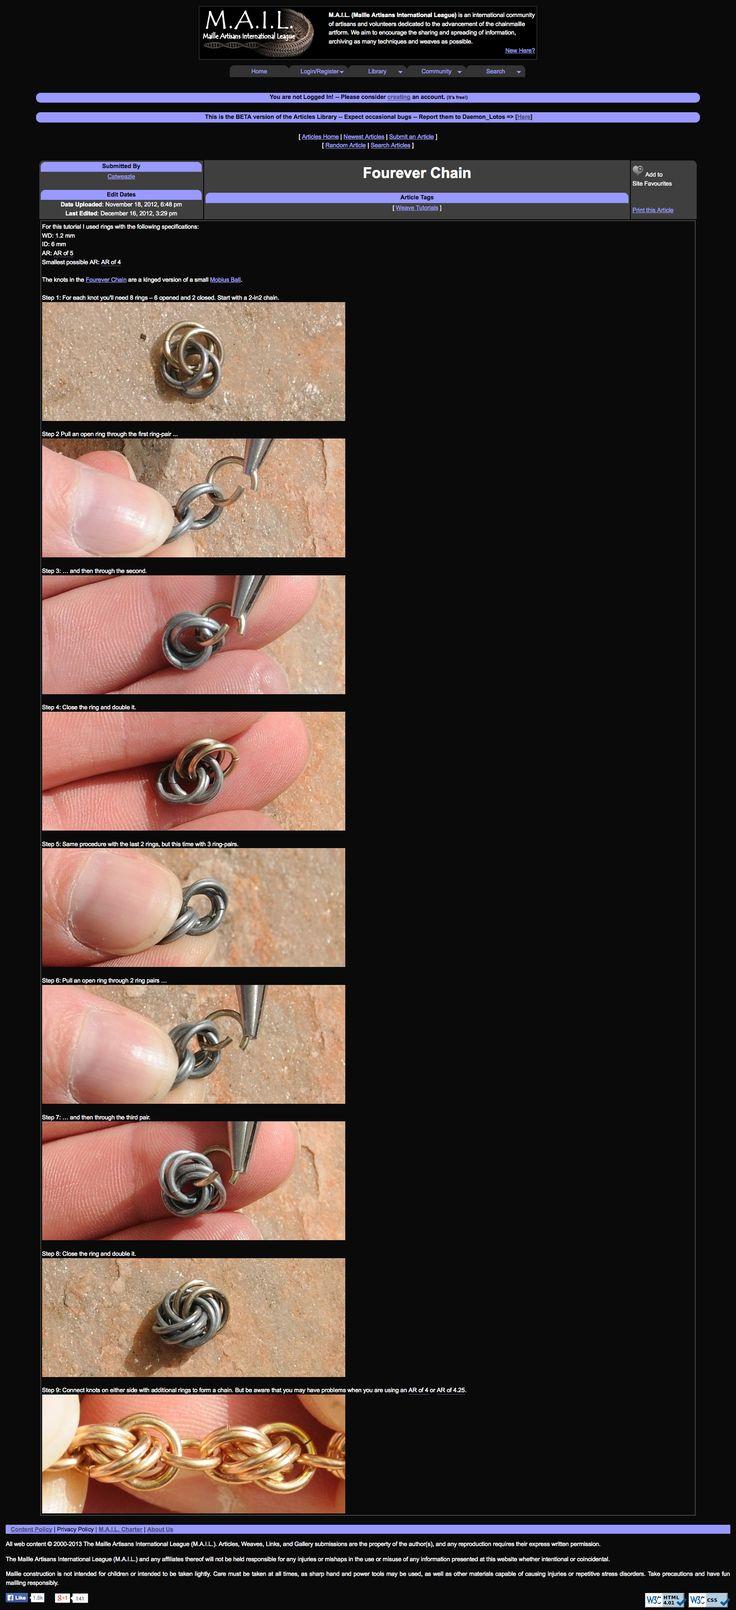 fourever chain